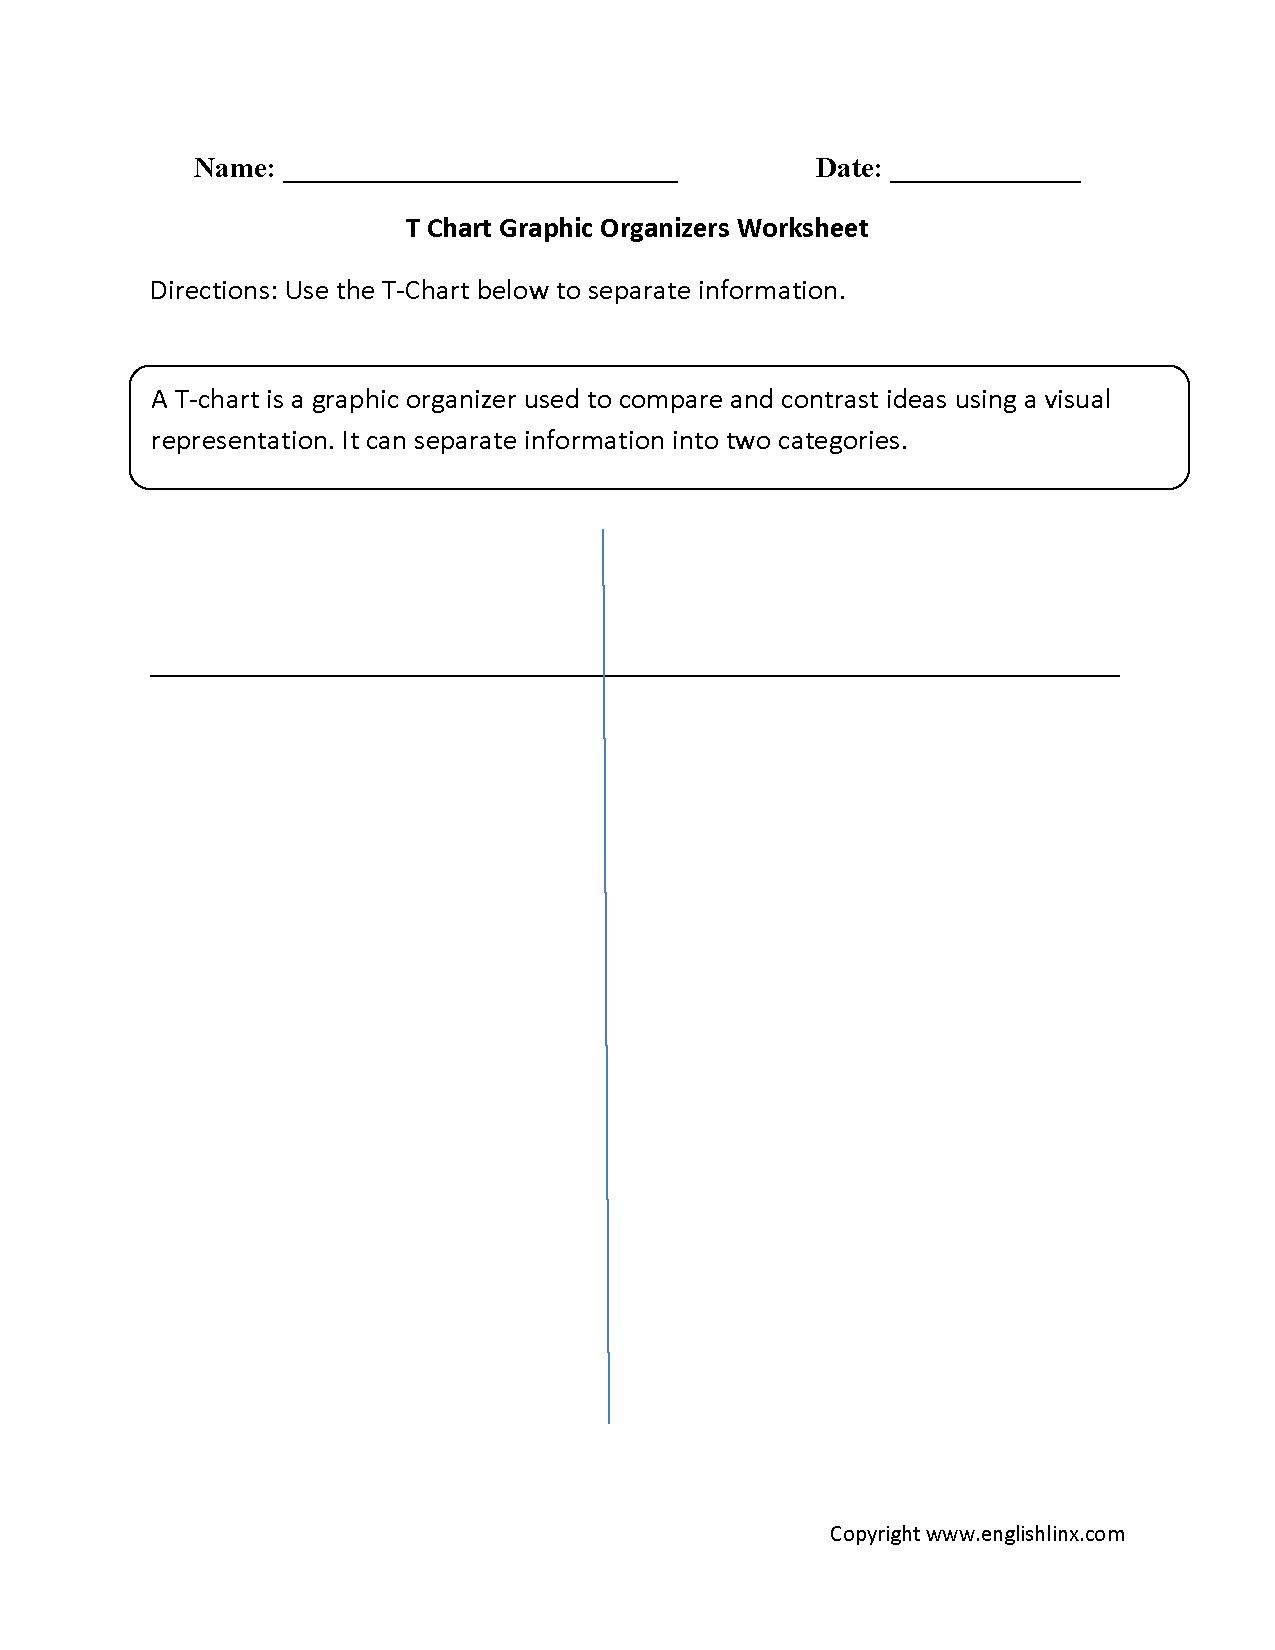 Englishlinx | Graphic Organizers Worksheets - Free Printable Main Idea Graphic Organizer